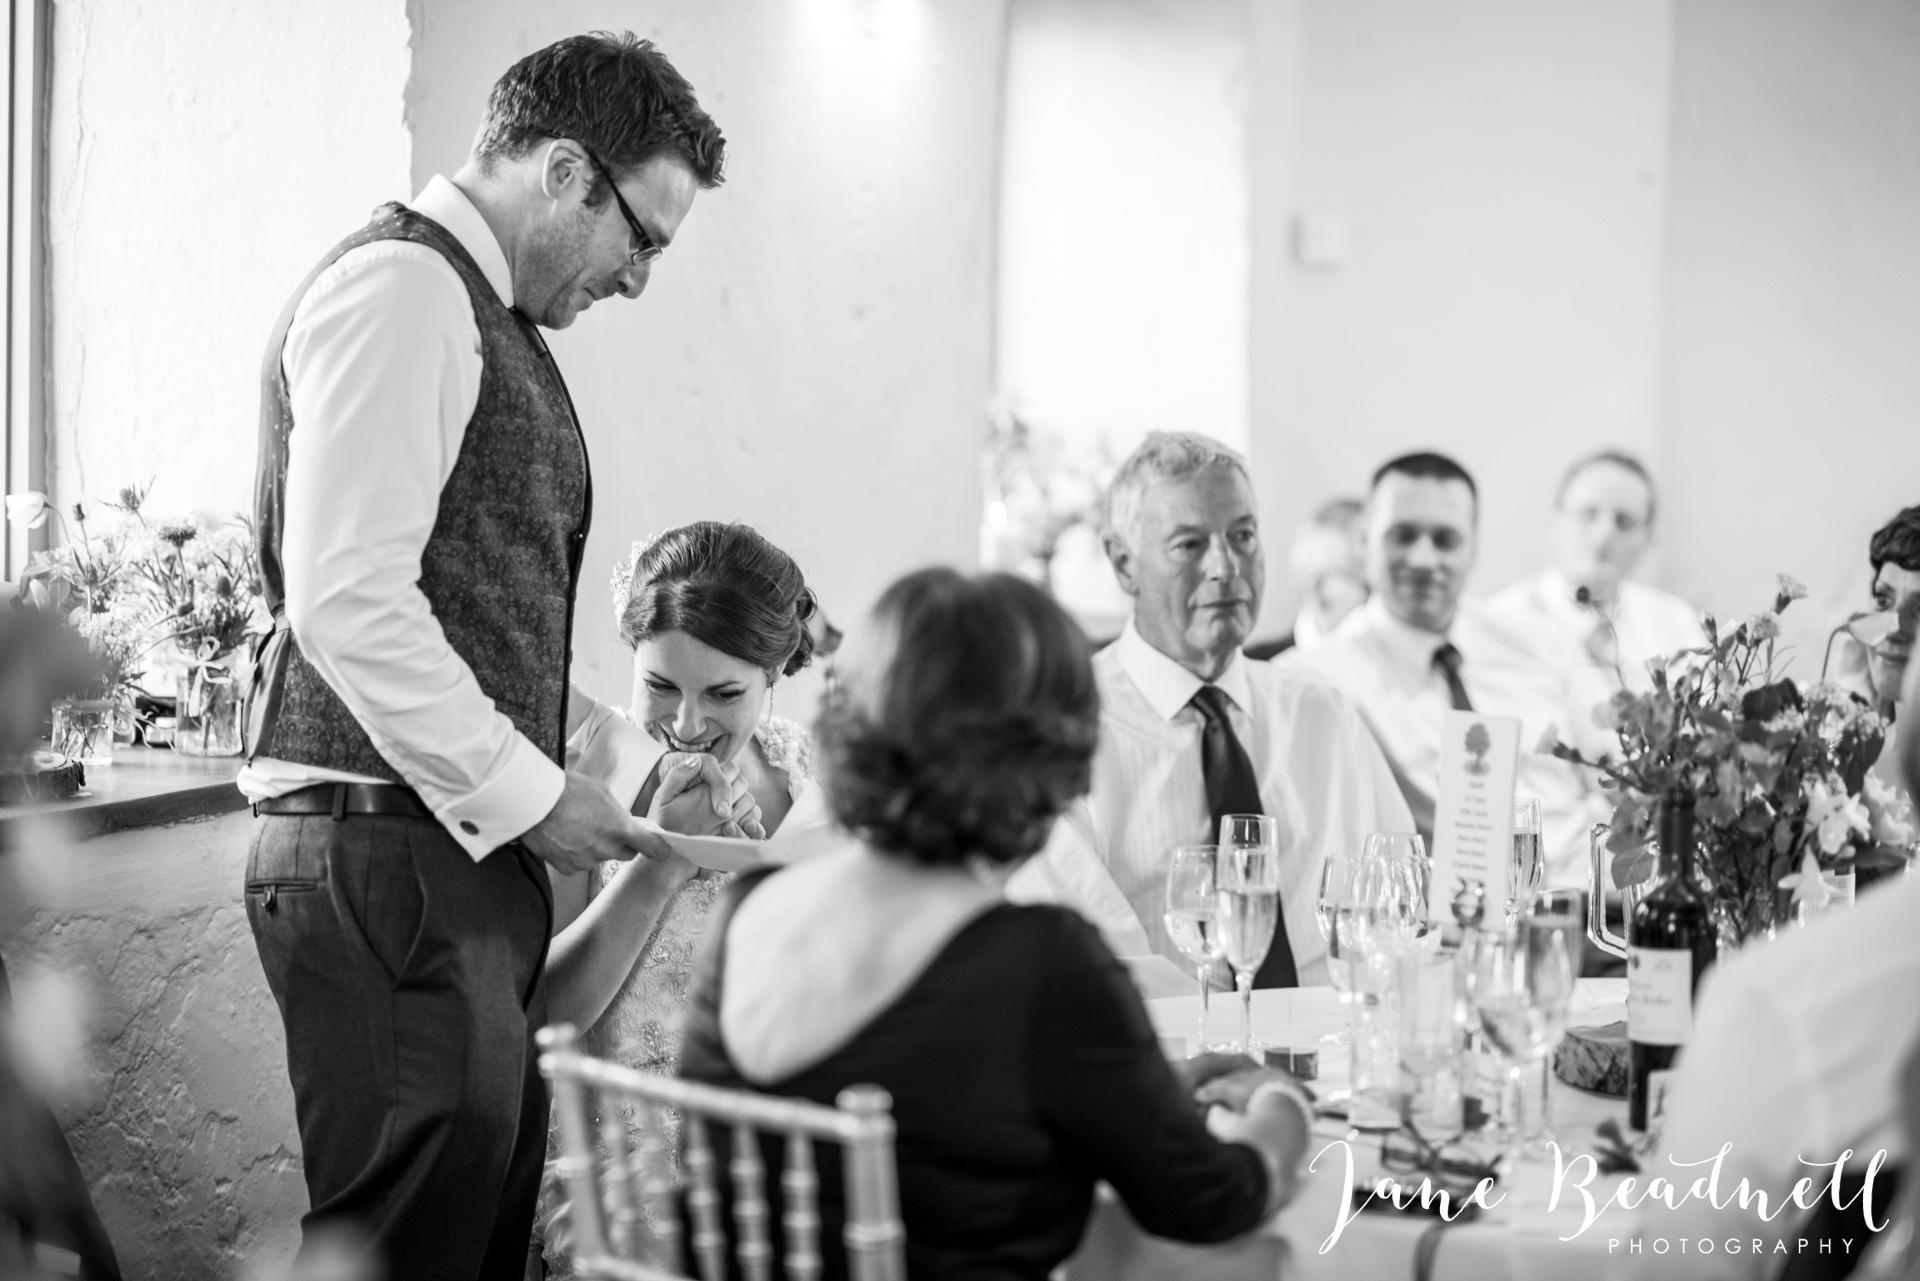 Bath Abbey wedding photography by fine art wedding photographer Leeds Jane Beadnell_58